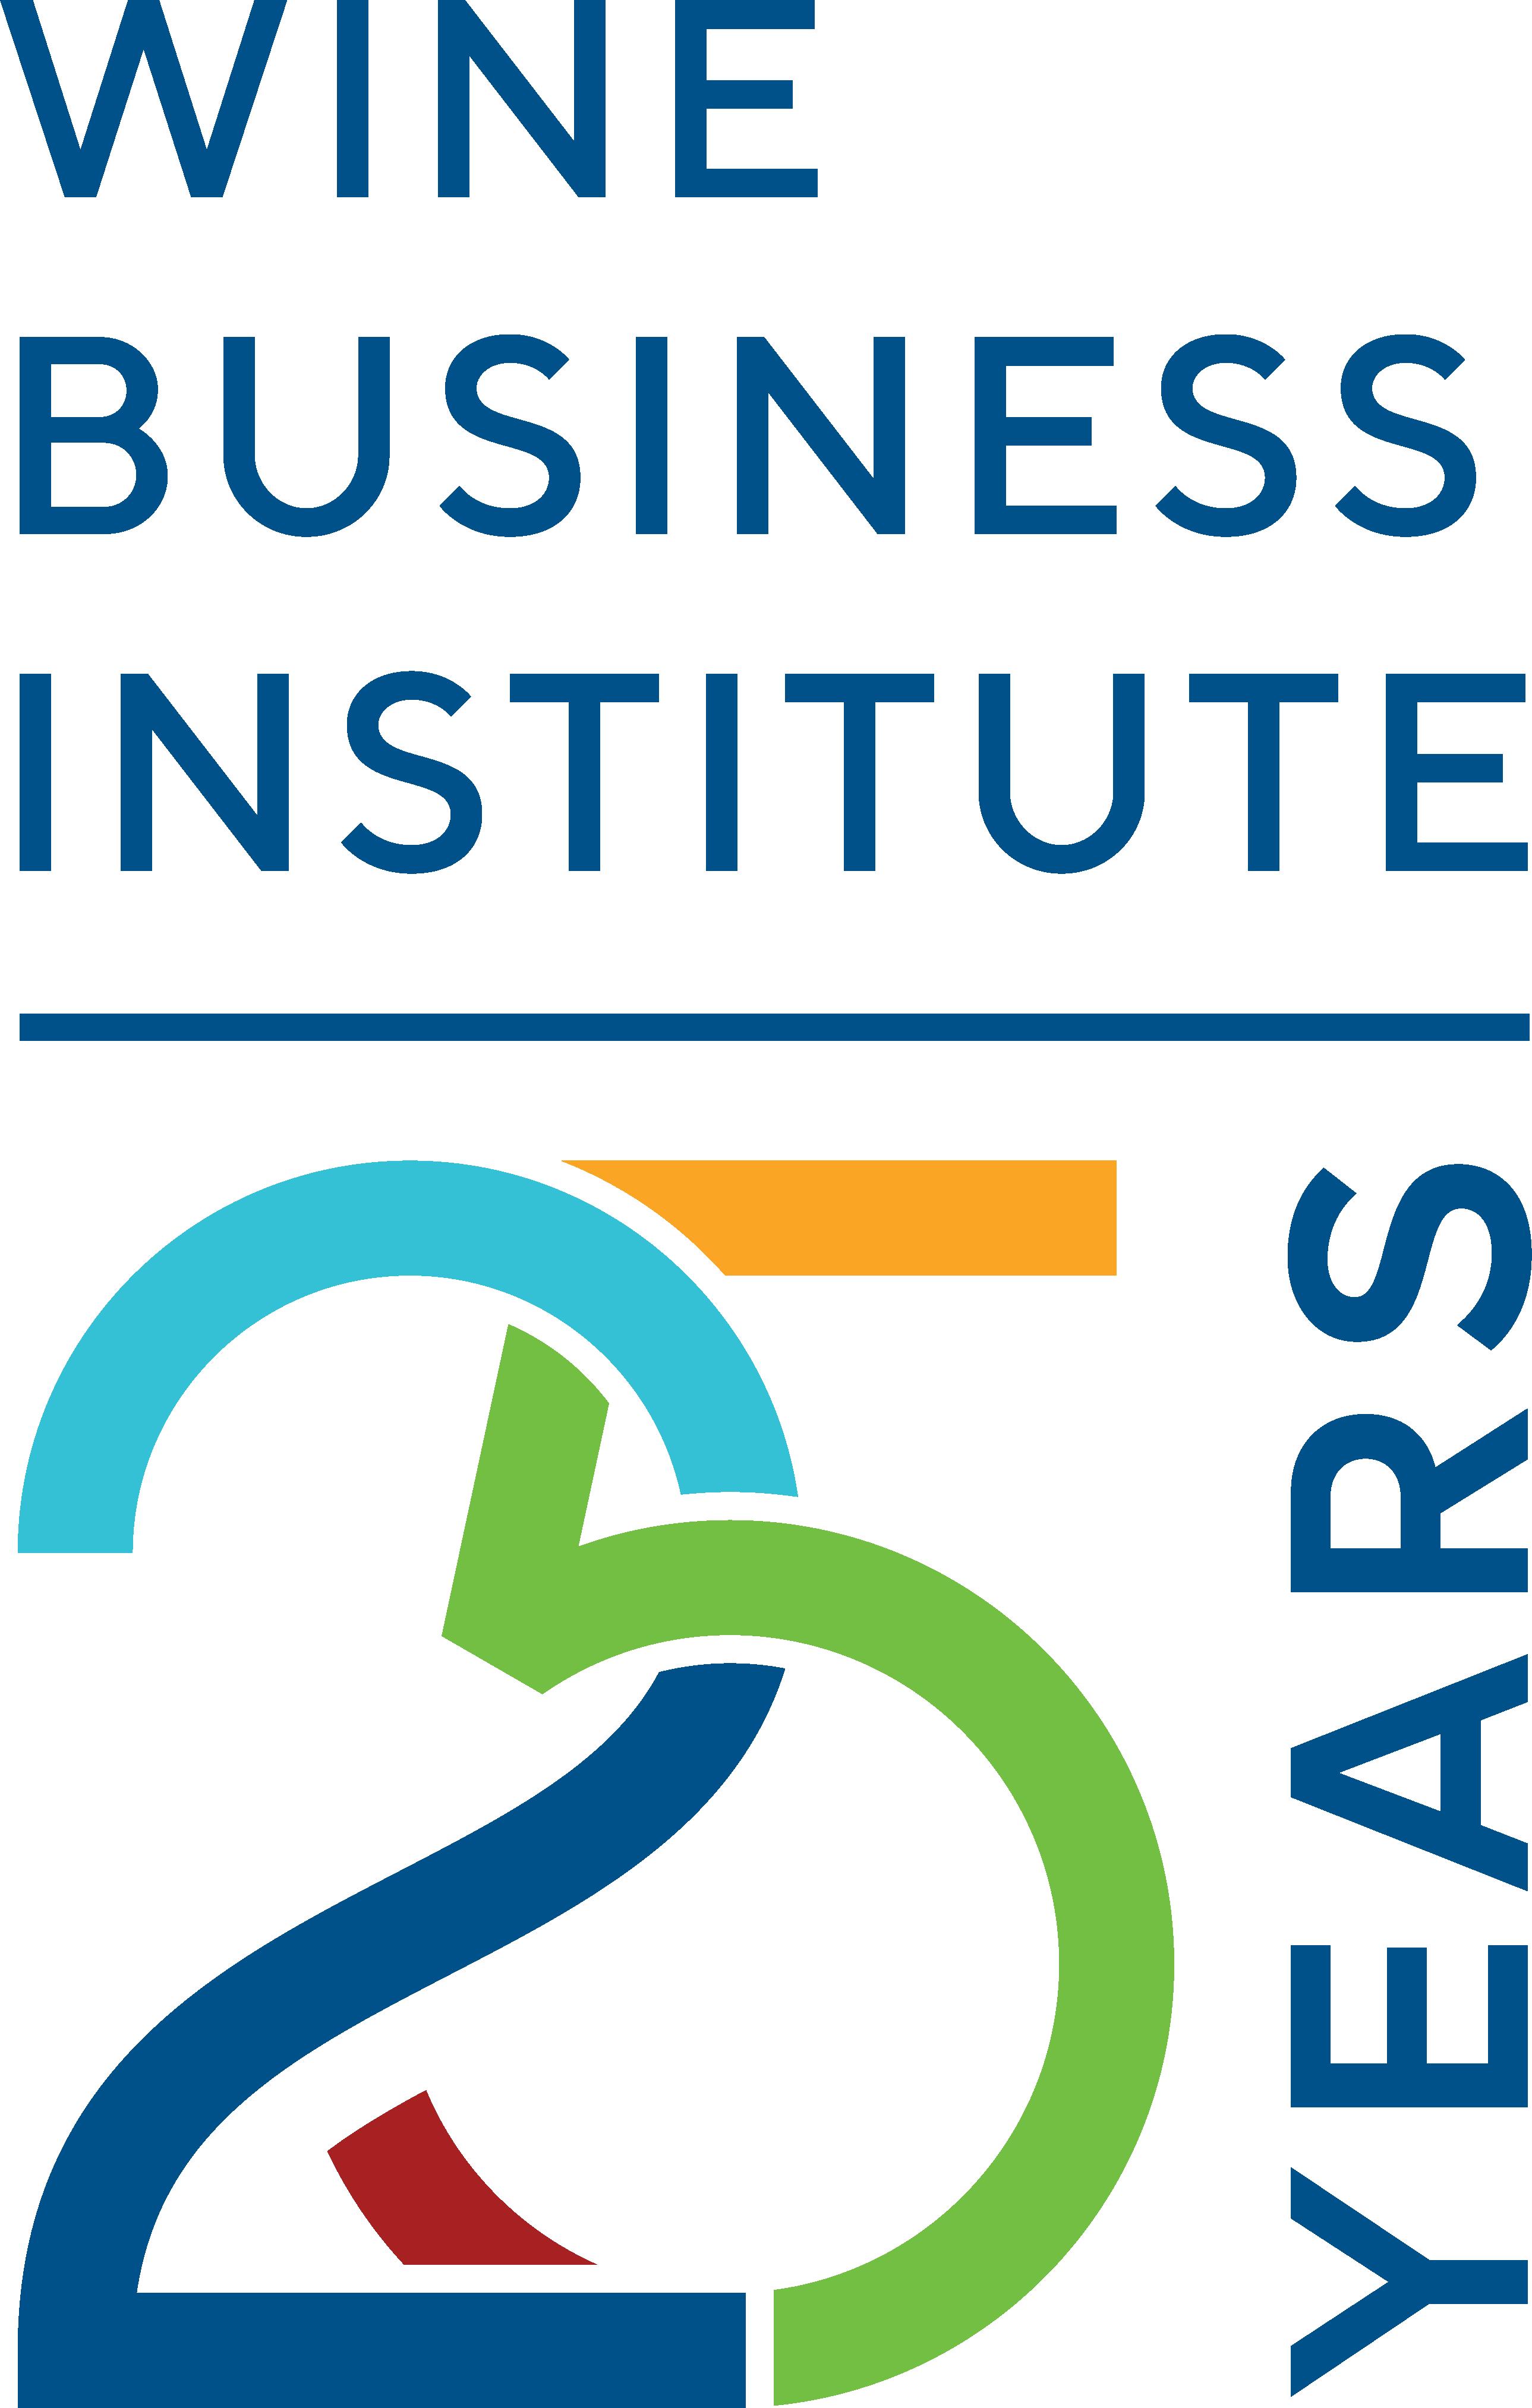 Wine Business Institute 25th anniversary logo